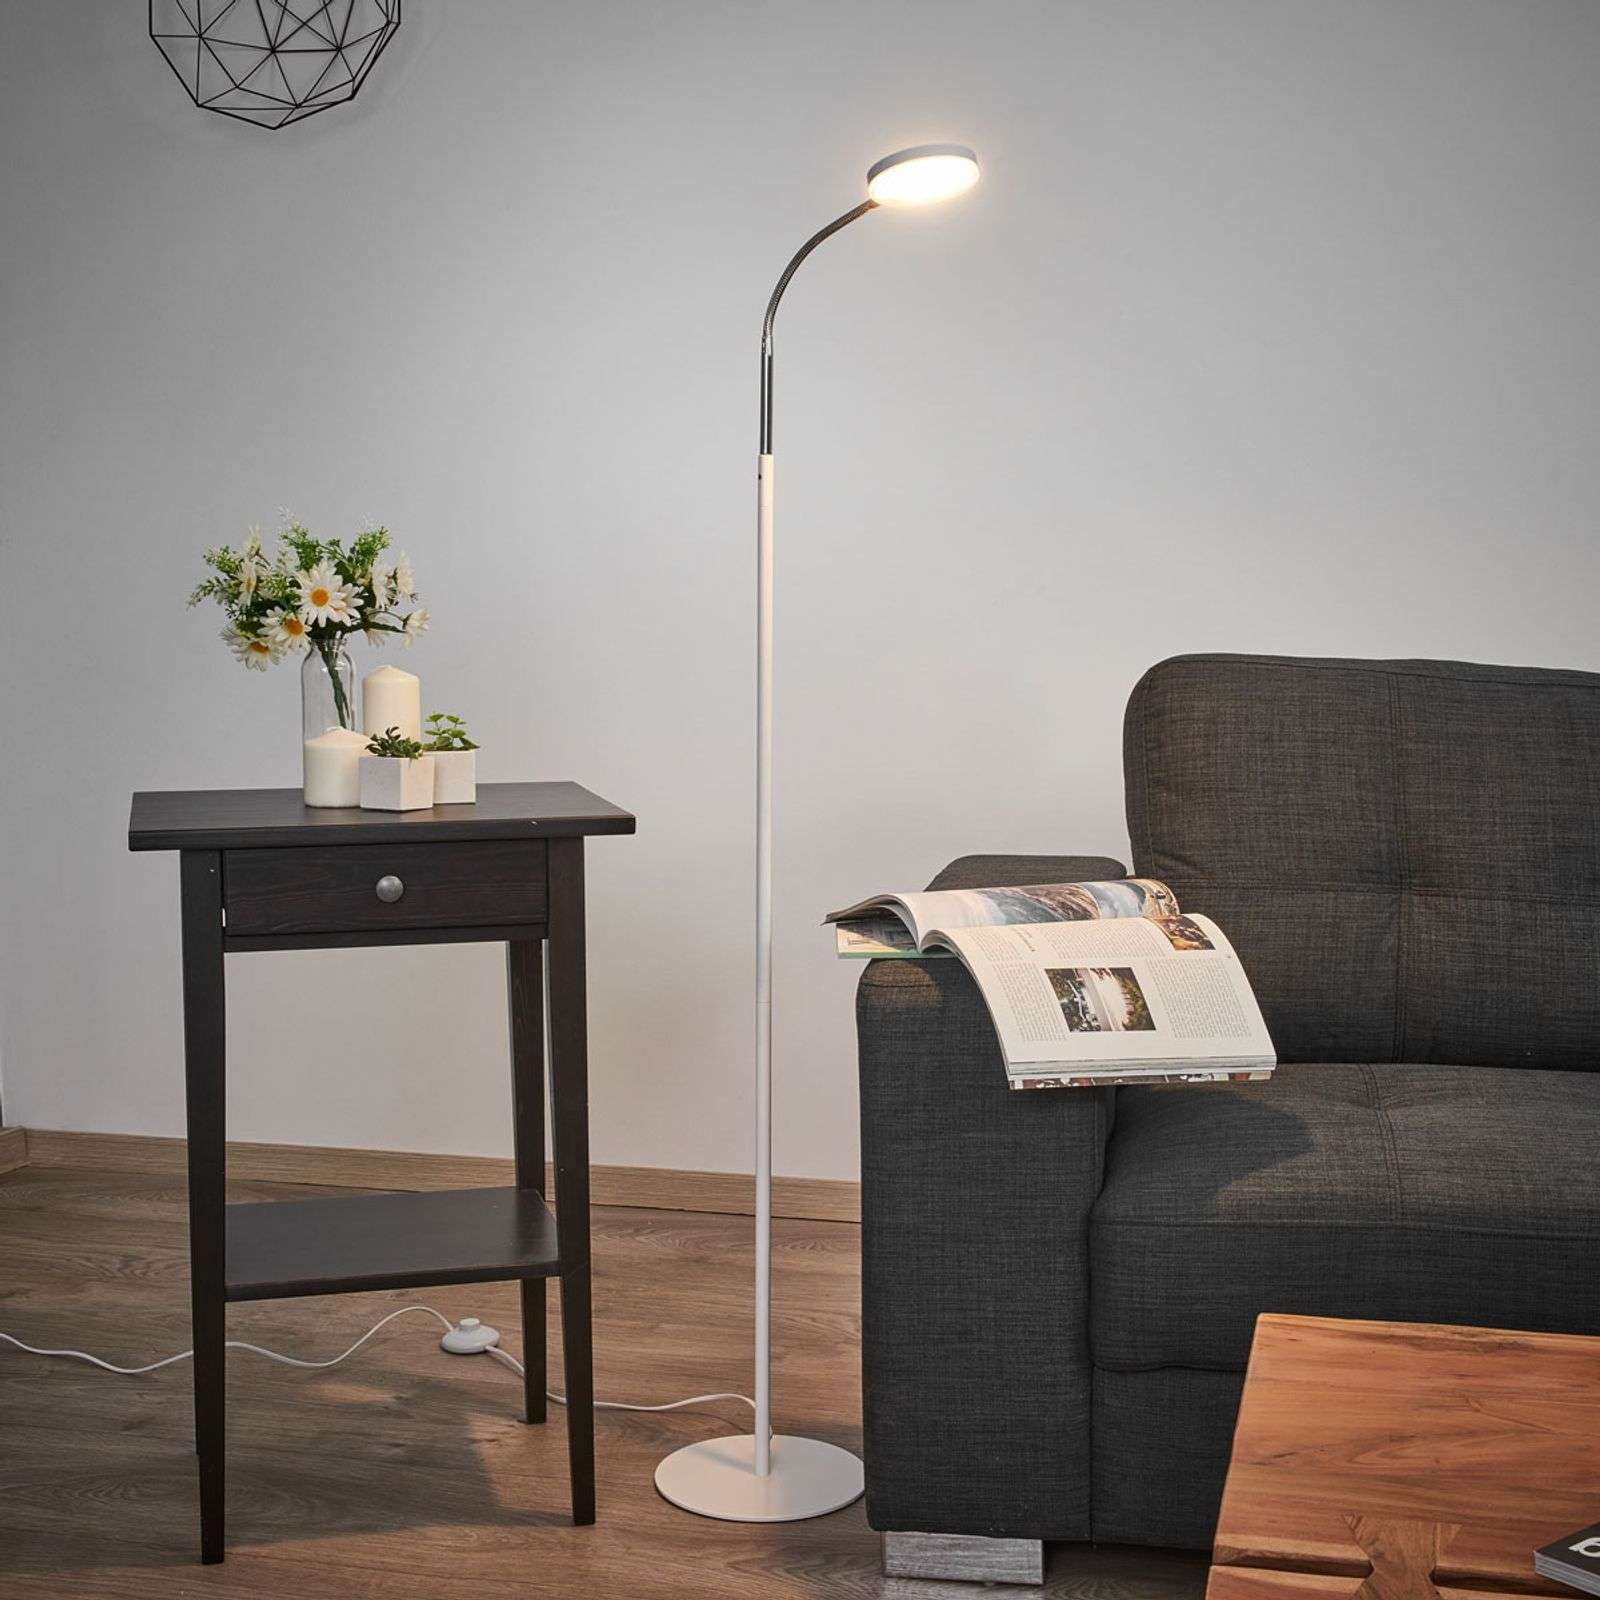 Full Size of Stehlampen Modern Led Stehlampe Milow Lampenwelt Wohnzimmer Leseleuchte Stehleuchte Moderne Landhausküche Modernes Sofa Tapete Küche Deckenleuchte Wohnzimmer Stehlampen Modern